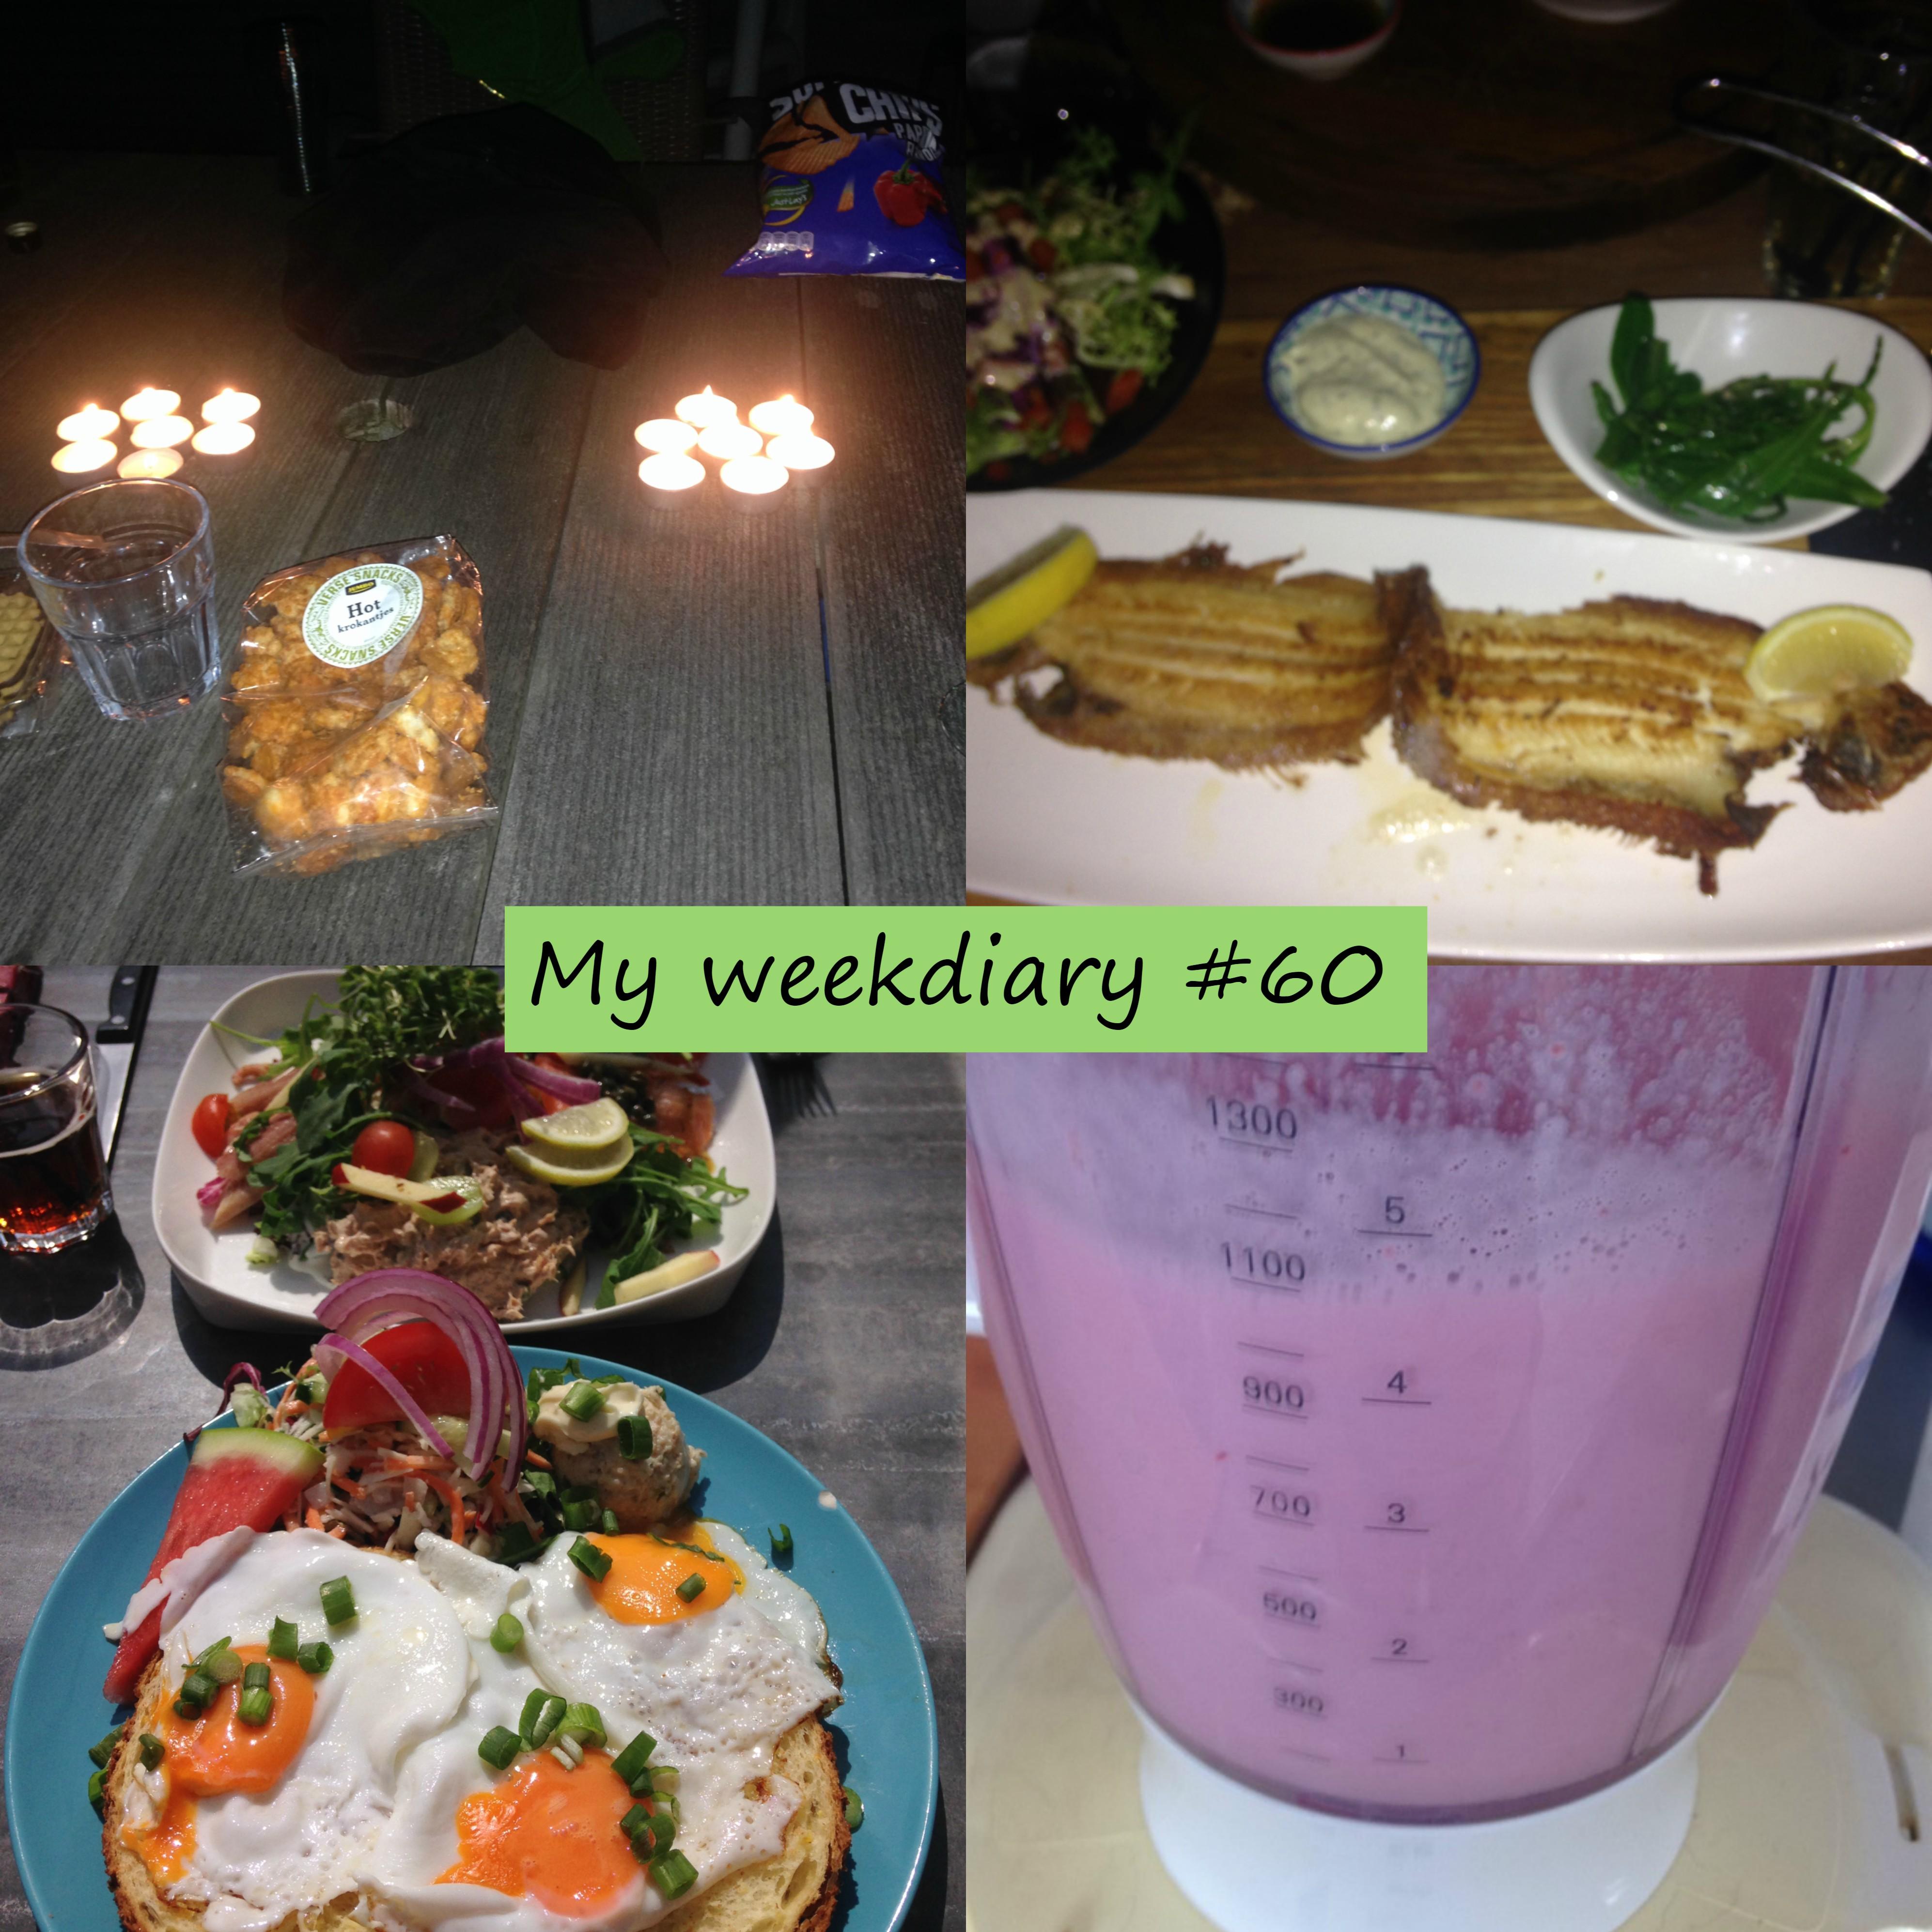 myweekdiary60